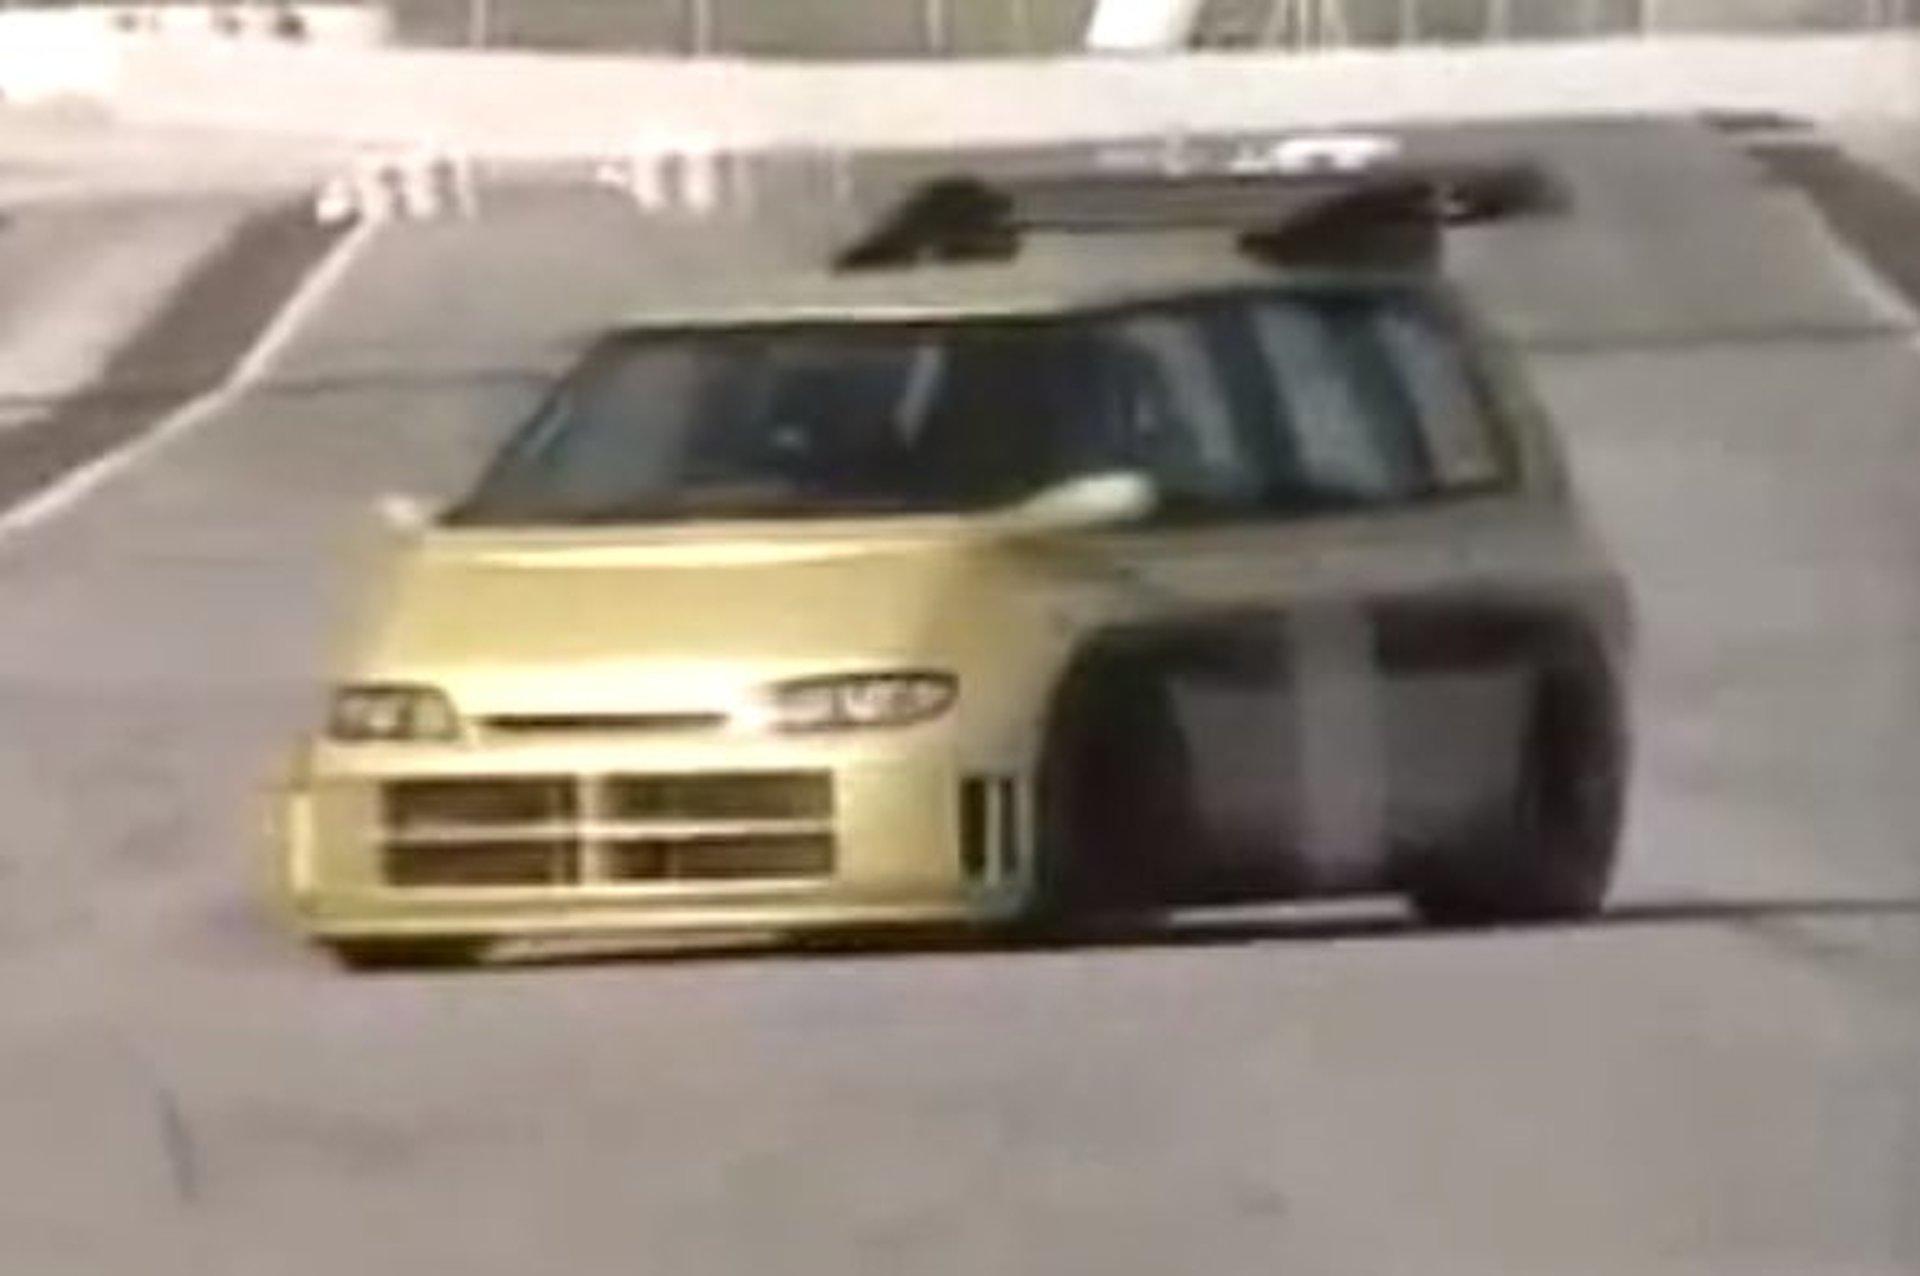 Video: Renault Espace F1- The Original Insane Renaultsport Creation